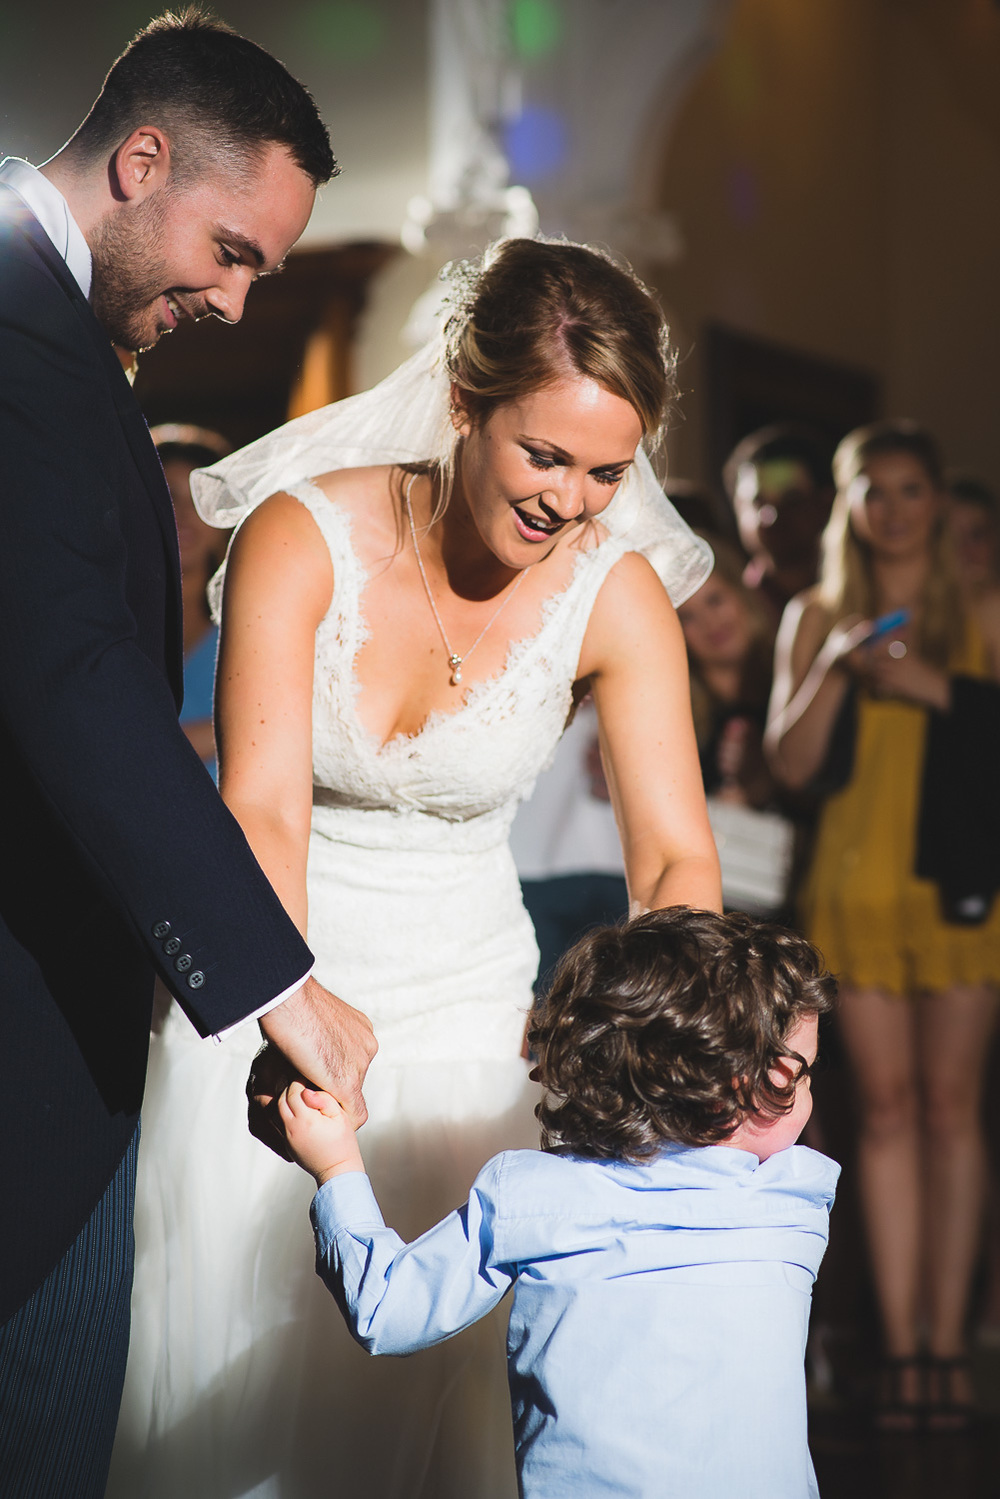 clevedon-hall-somerset-wedding-photographer-49.jpg